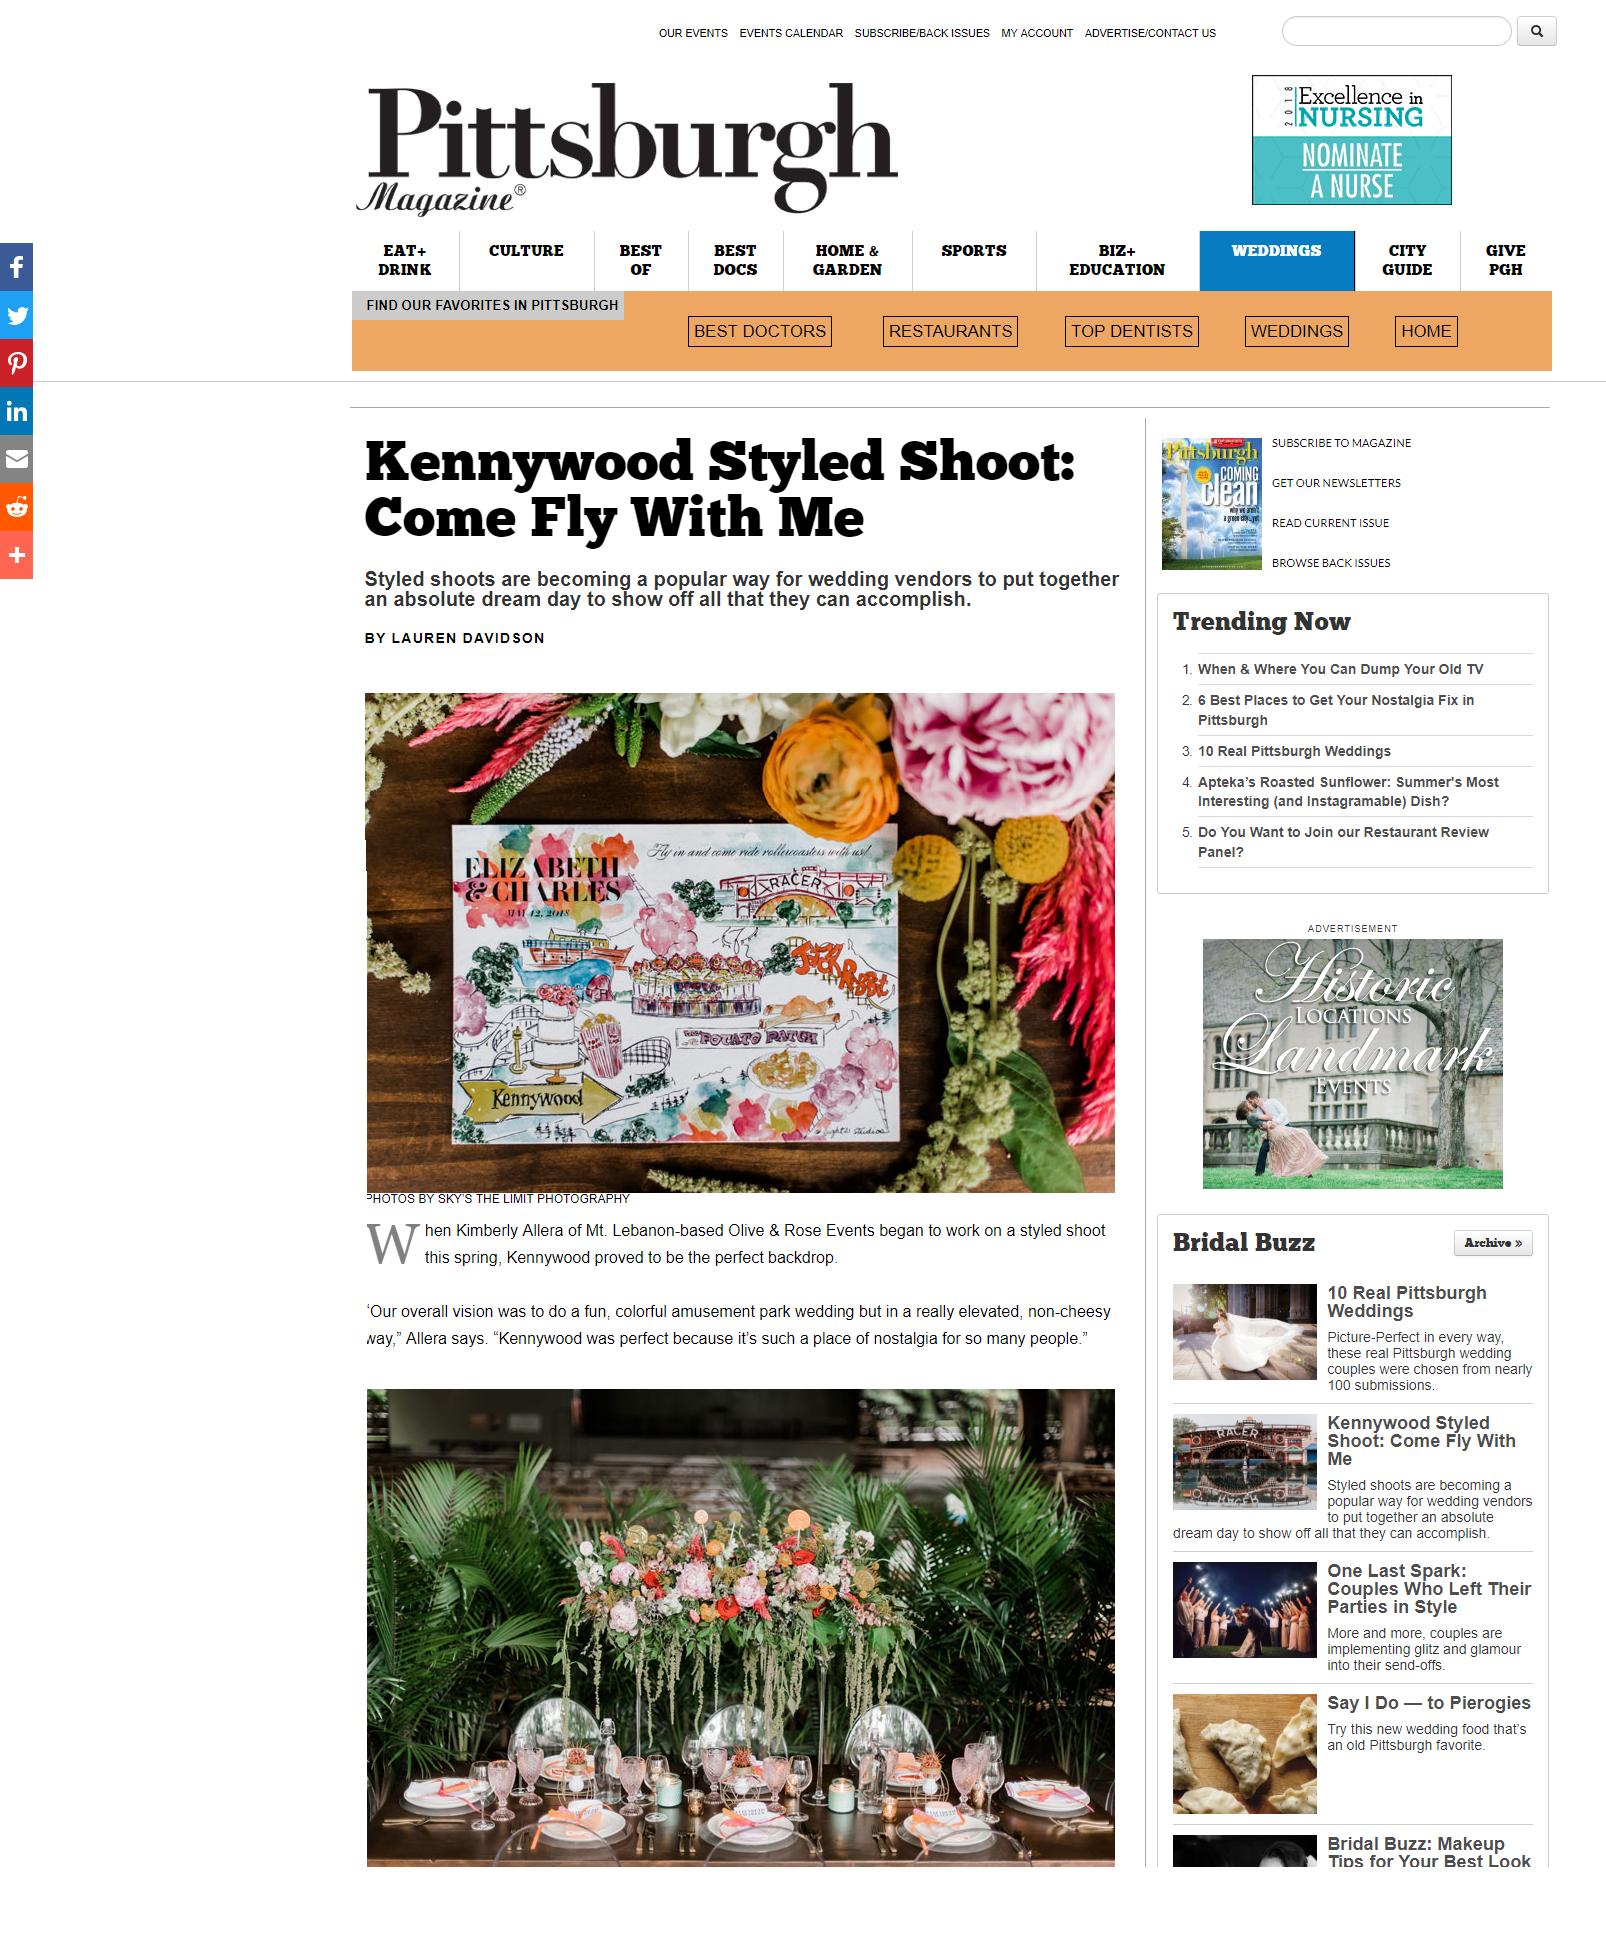 Pittsburgh Magazine Weddings_August 2018_Kennywood Shoot.png